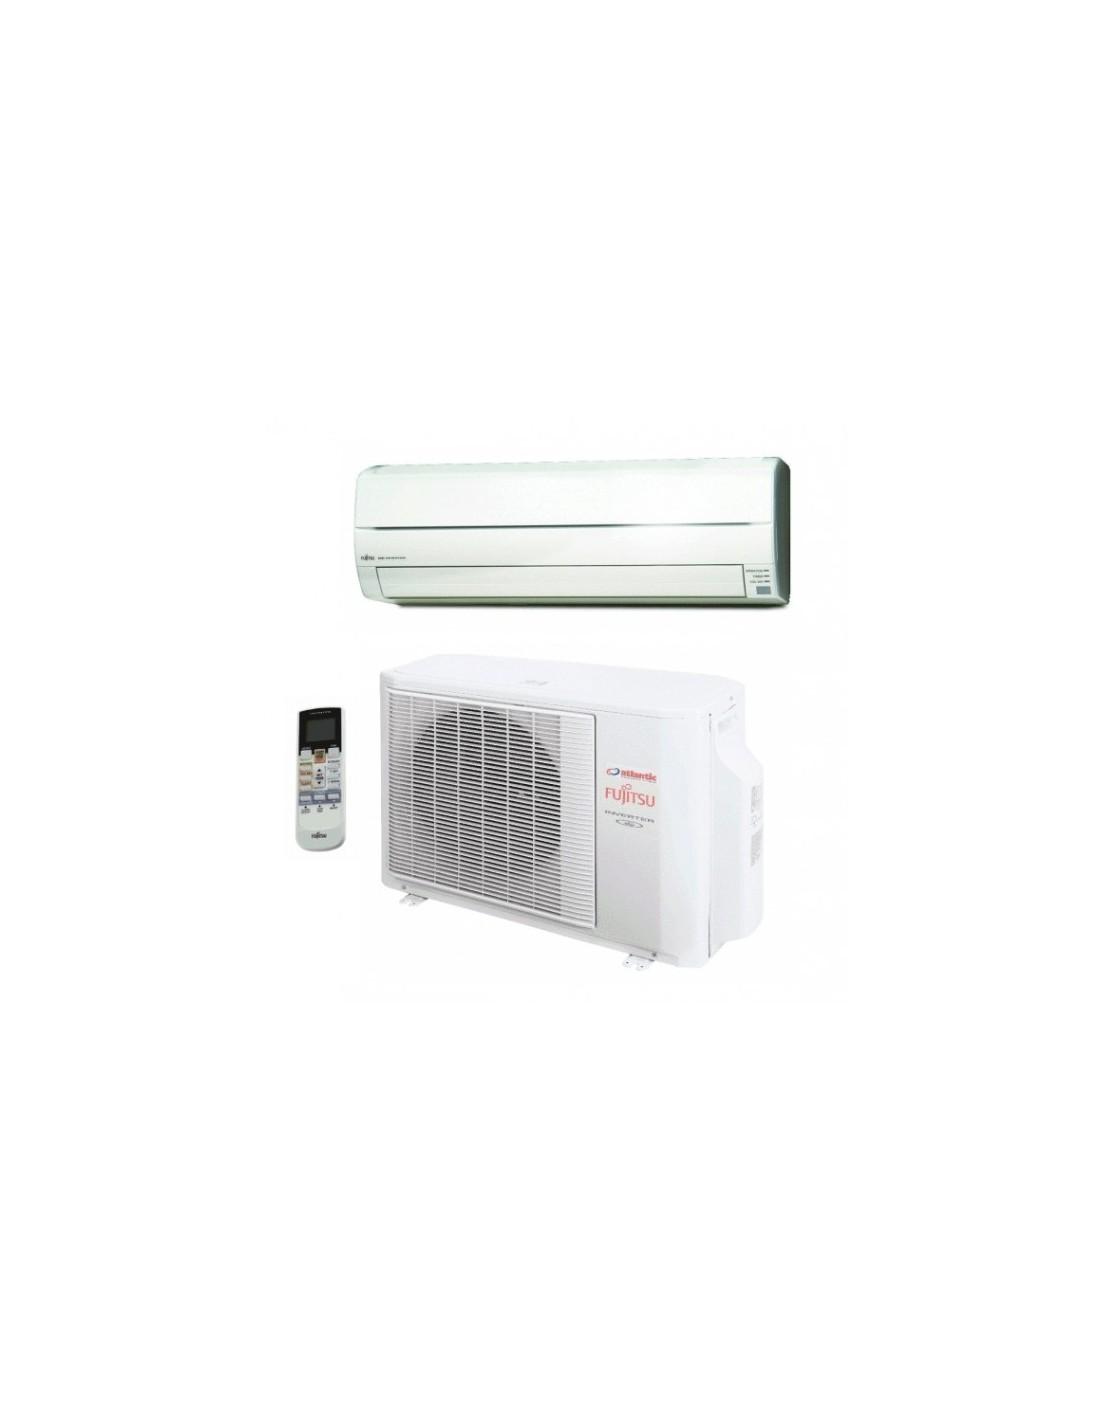 climatisation reversible infos sur la climatisation share the knownledge. Black Bedroom Furniture Sets. Home Design Ideas